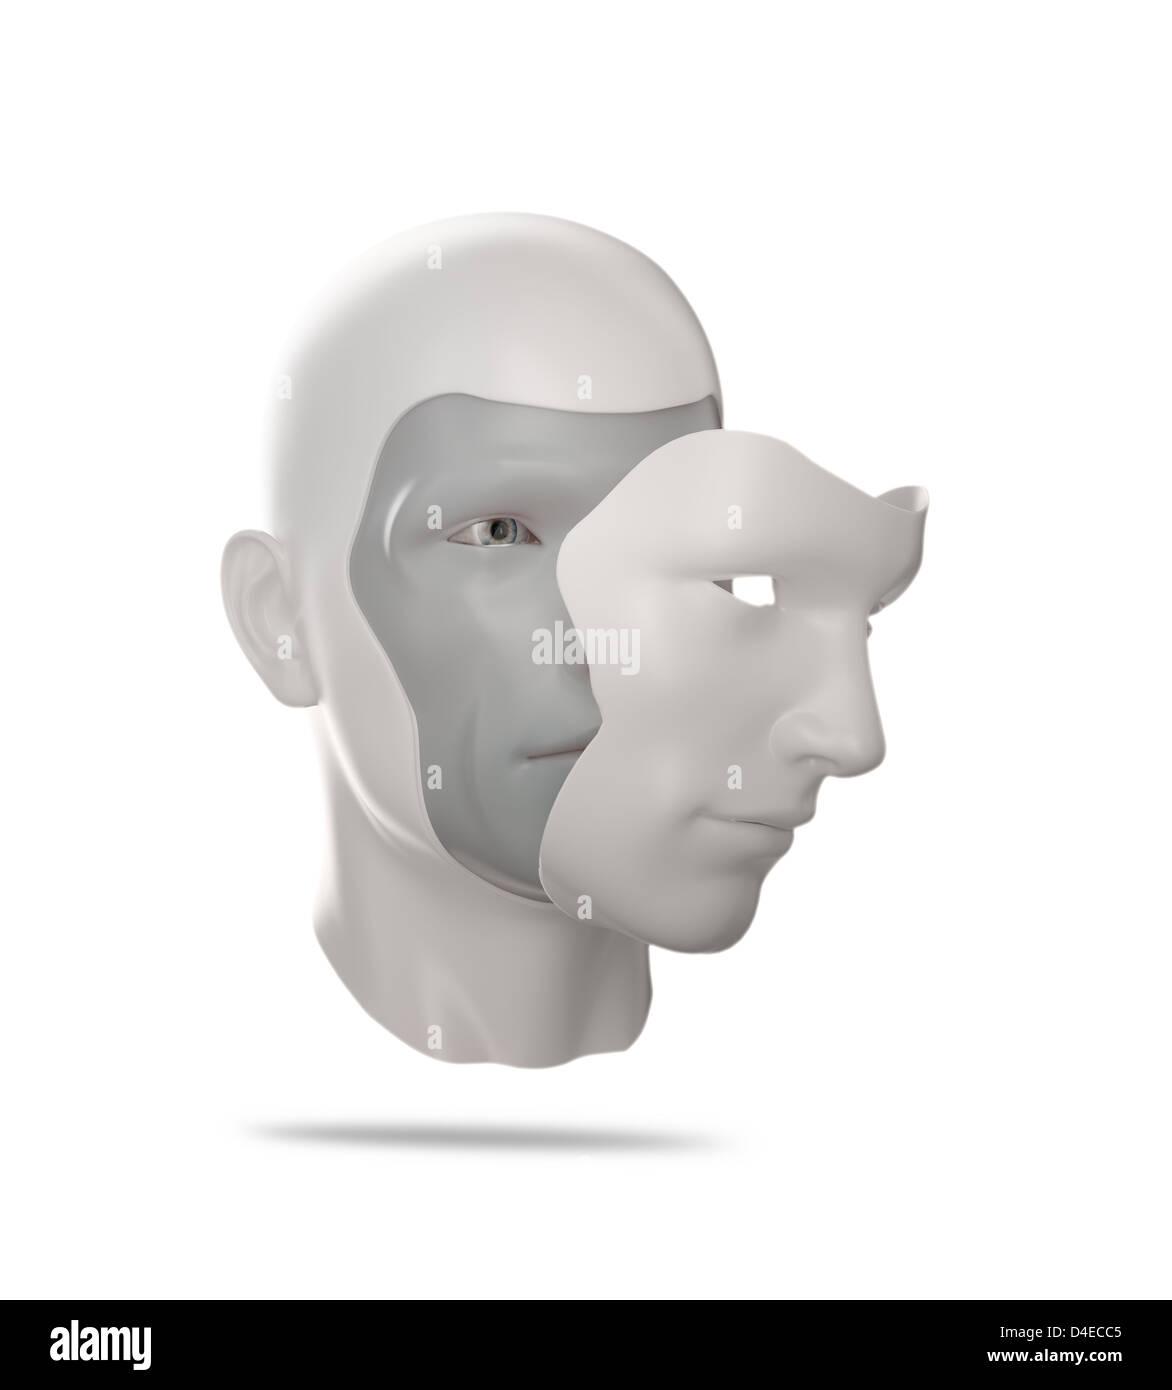 A human mask - psychology concept illustration - Stock Image